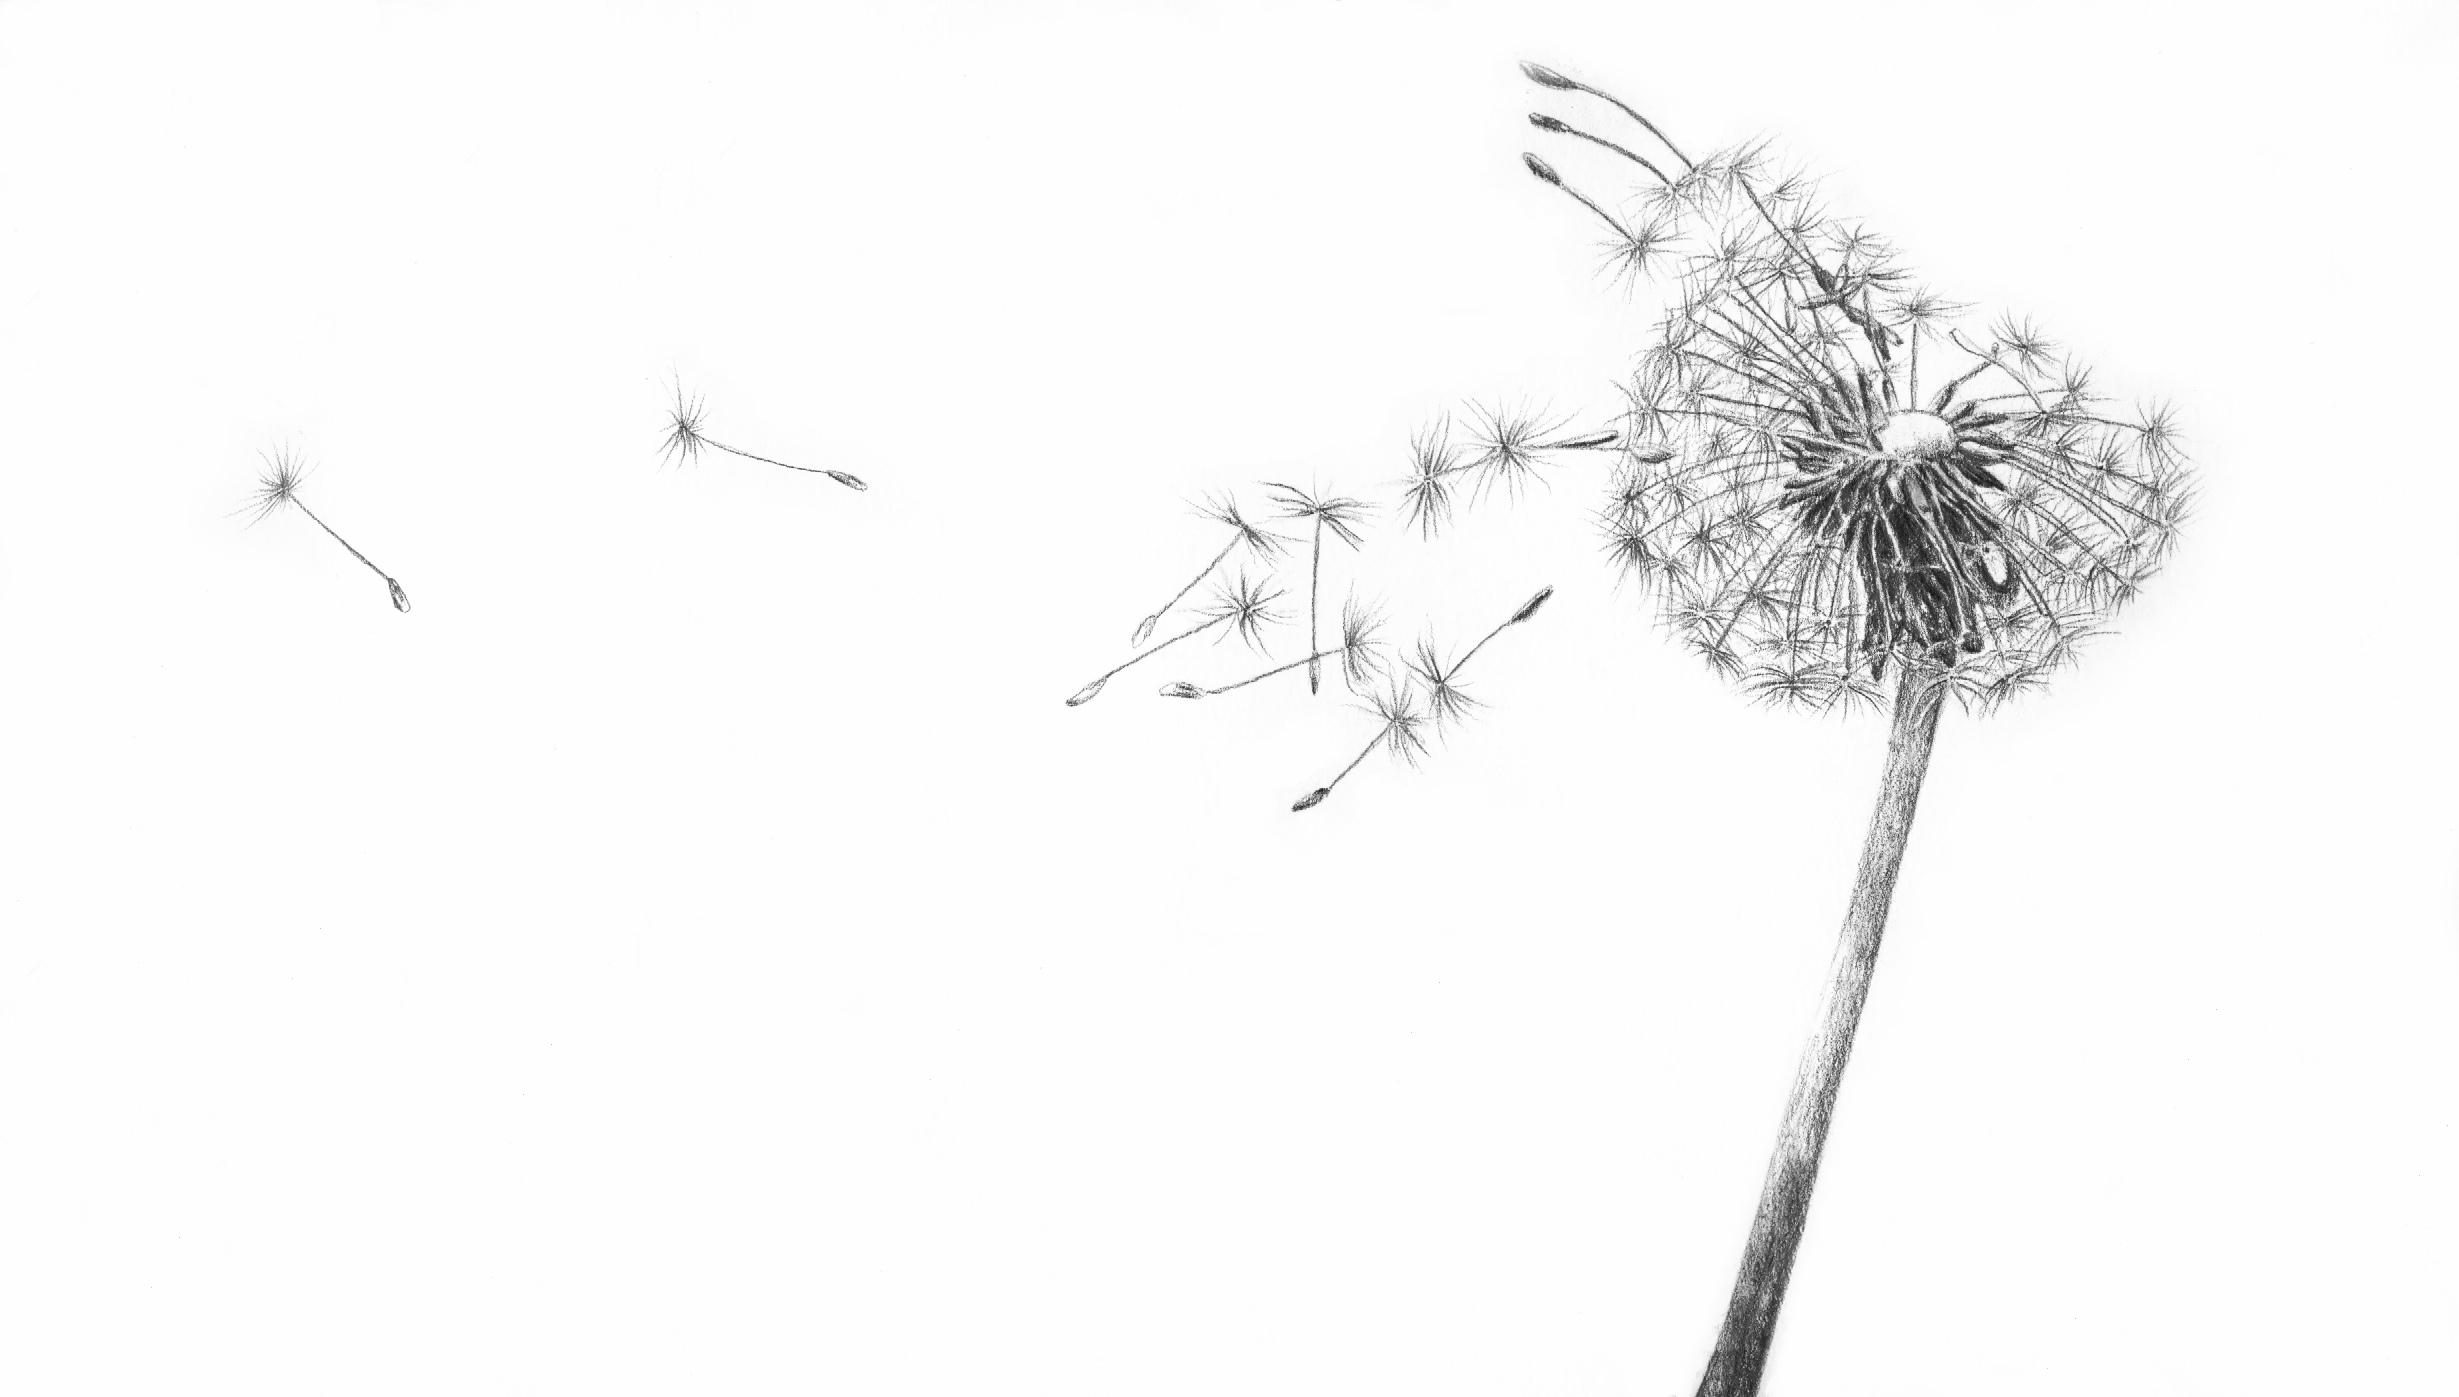 79672f639cd32b3559728e4904aebd78_dandelion-seasons-family-counseling-llc-black-and-white-dandelion-drawing_2459-1397.jpeg